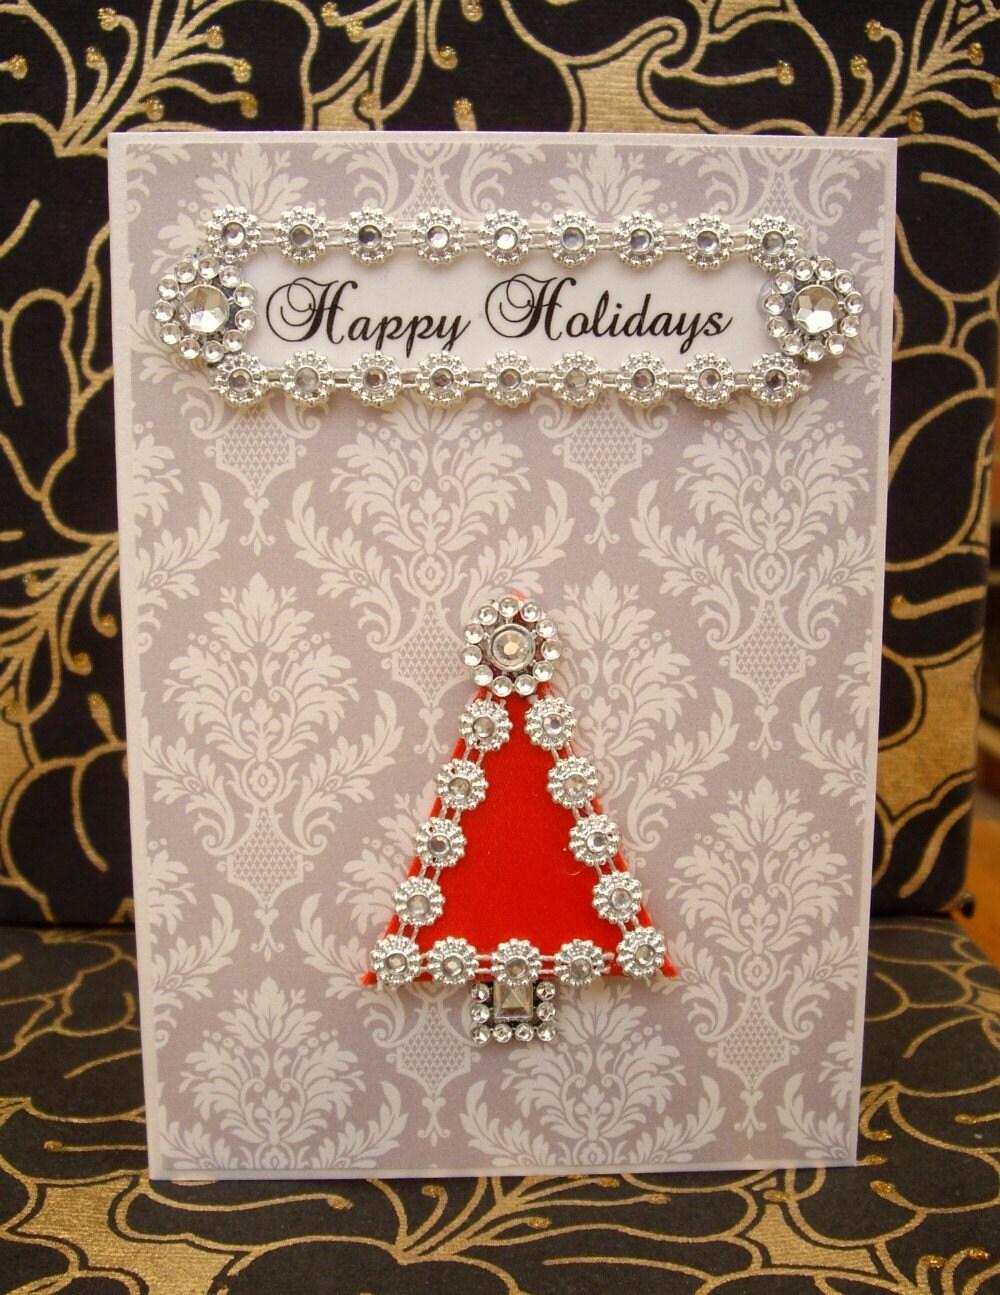 SALE Happy Holidays Tree Card / Handmade Greeting Card